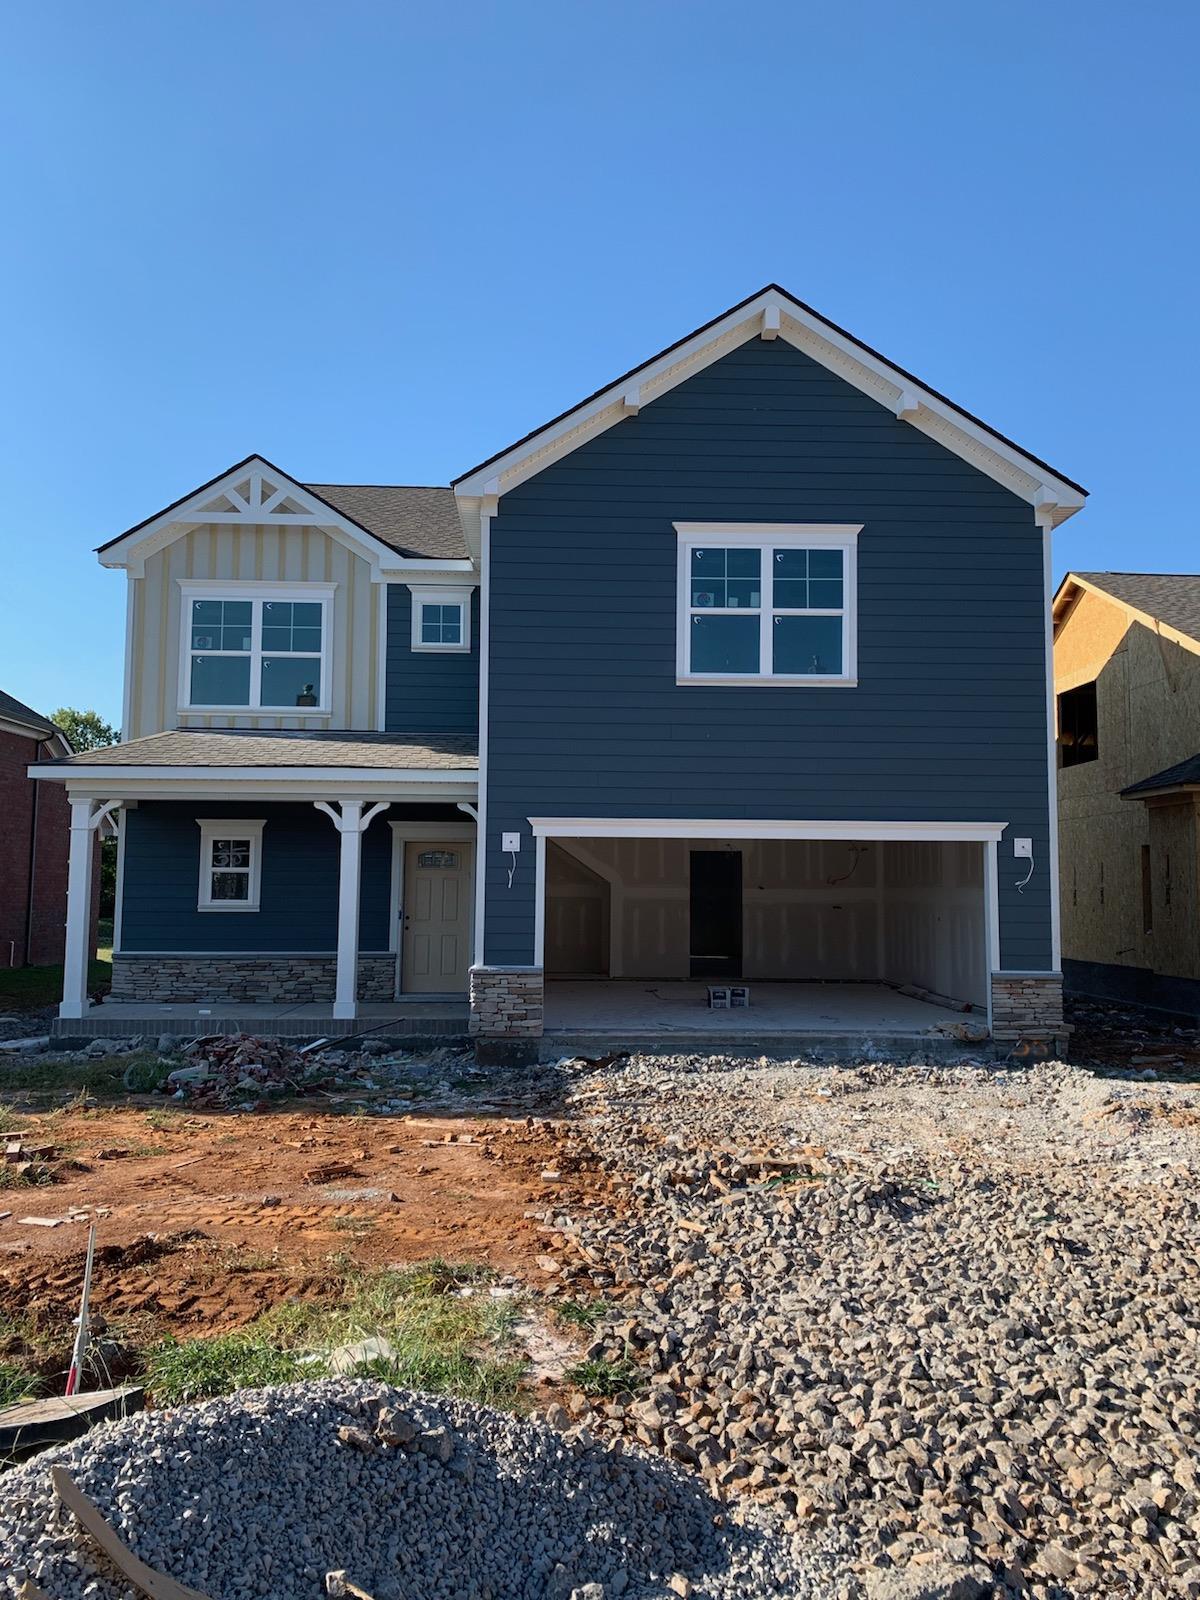 3430 Pear Blossom Way / Lt. 35, Murfreesboro, TN 37127 - Murfreesboro, TN real estate listing